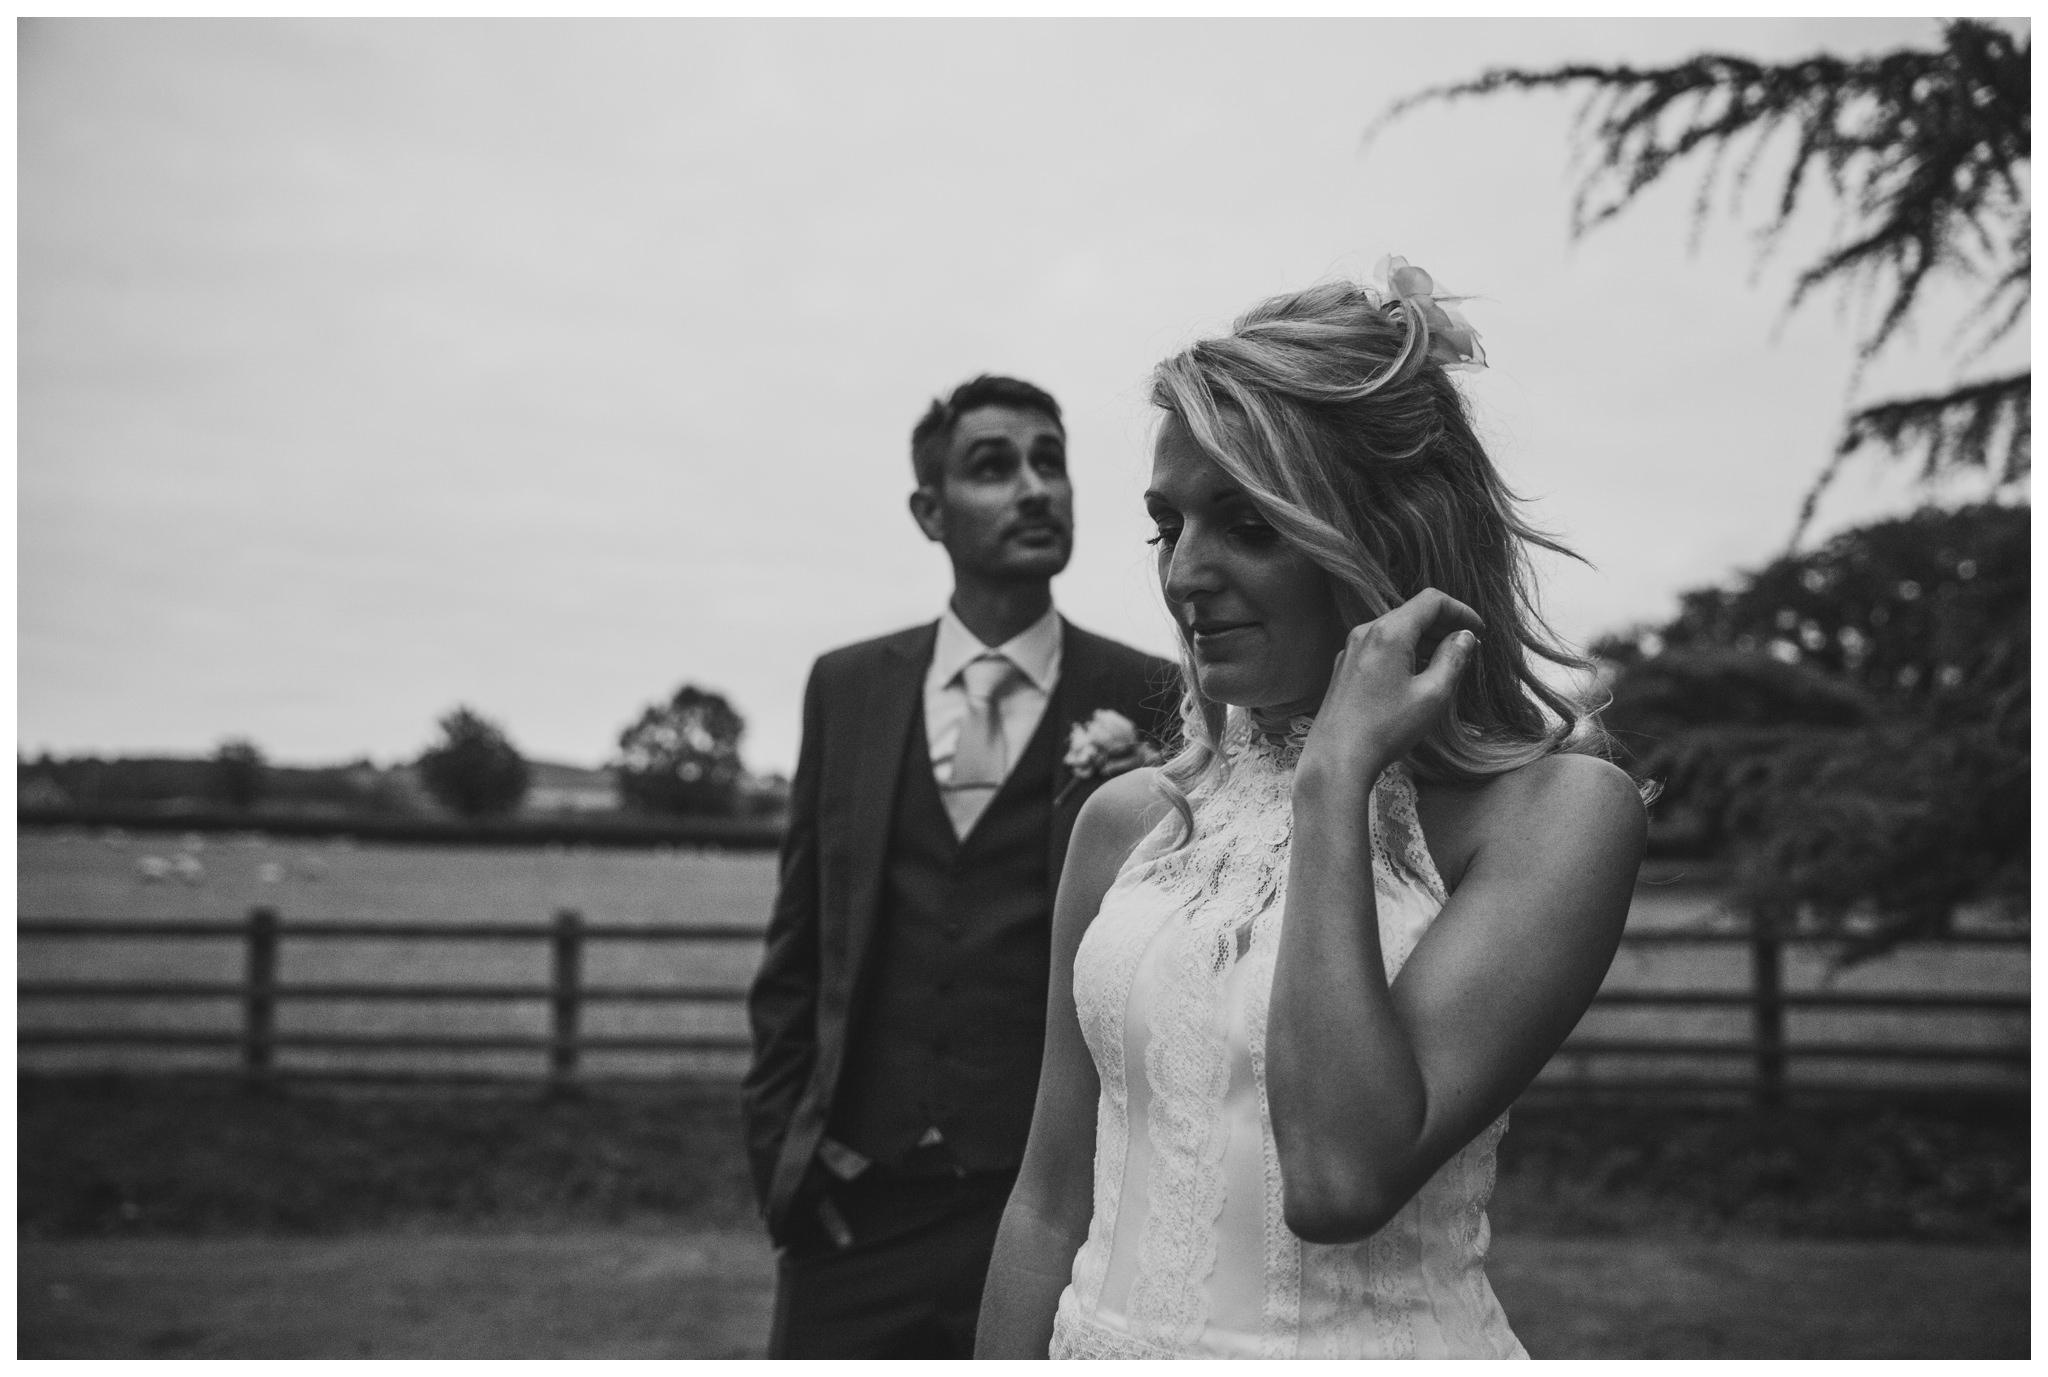 Richard Savage Photography - Wedding - Peterstone Court Brecon - 2016-05-11_0062